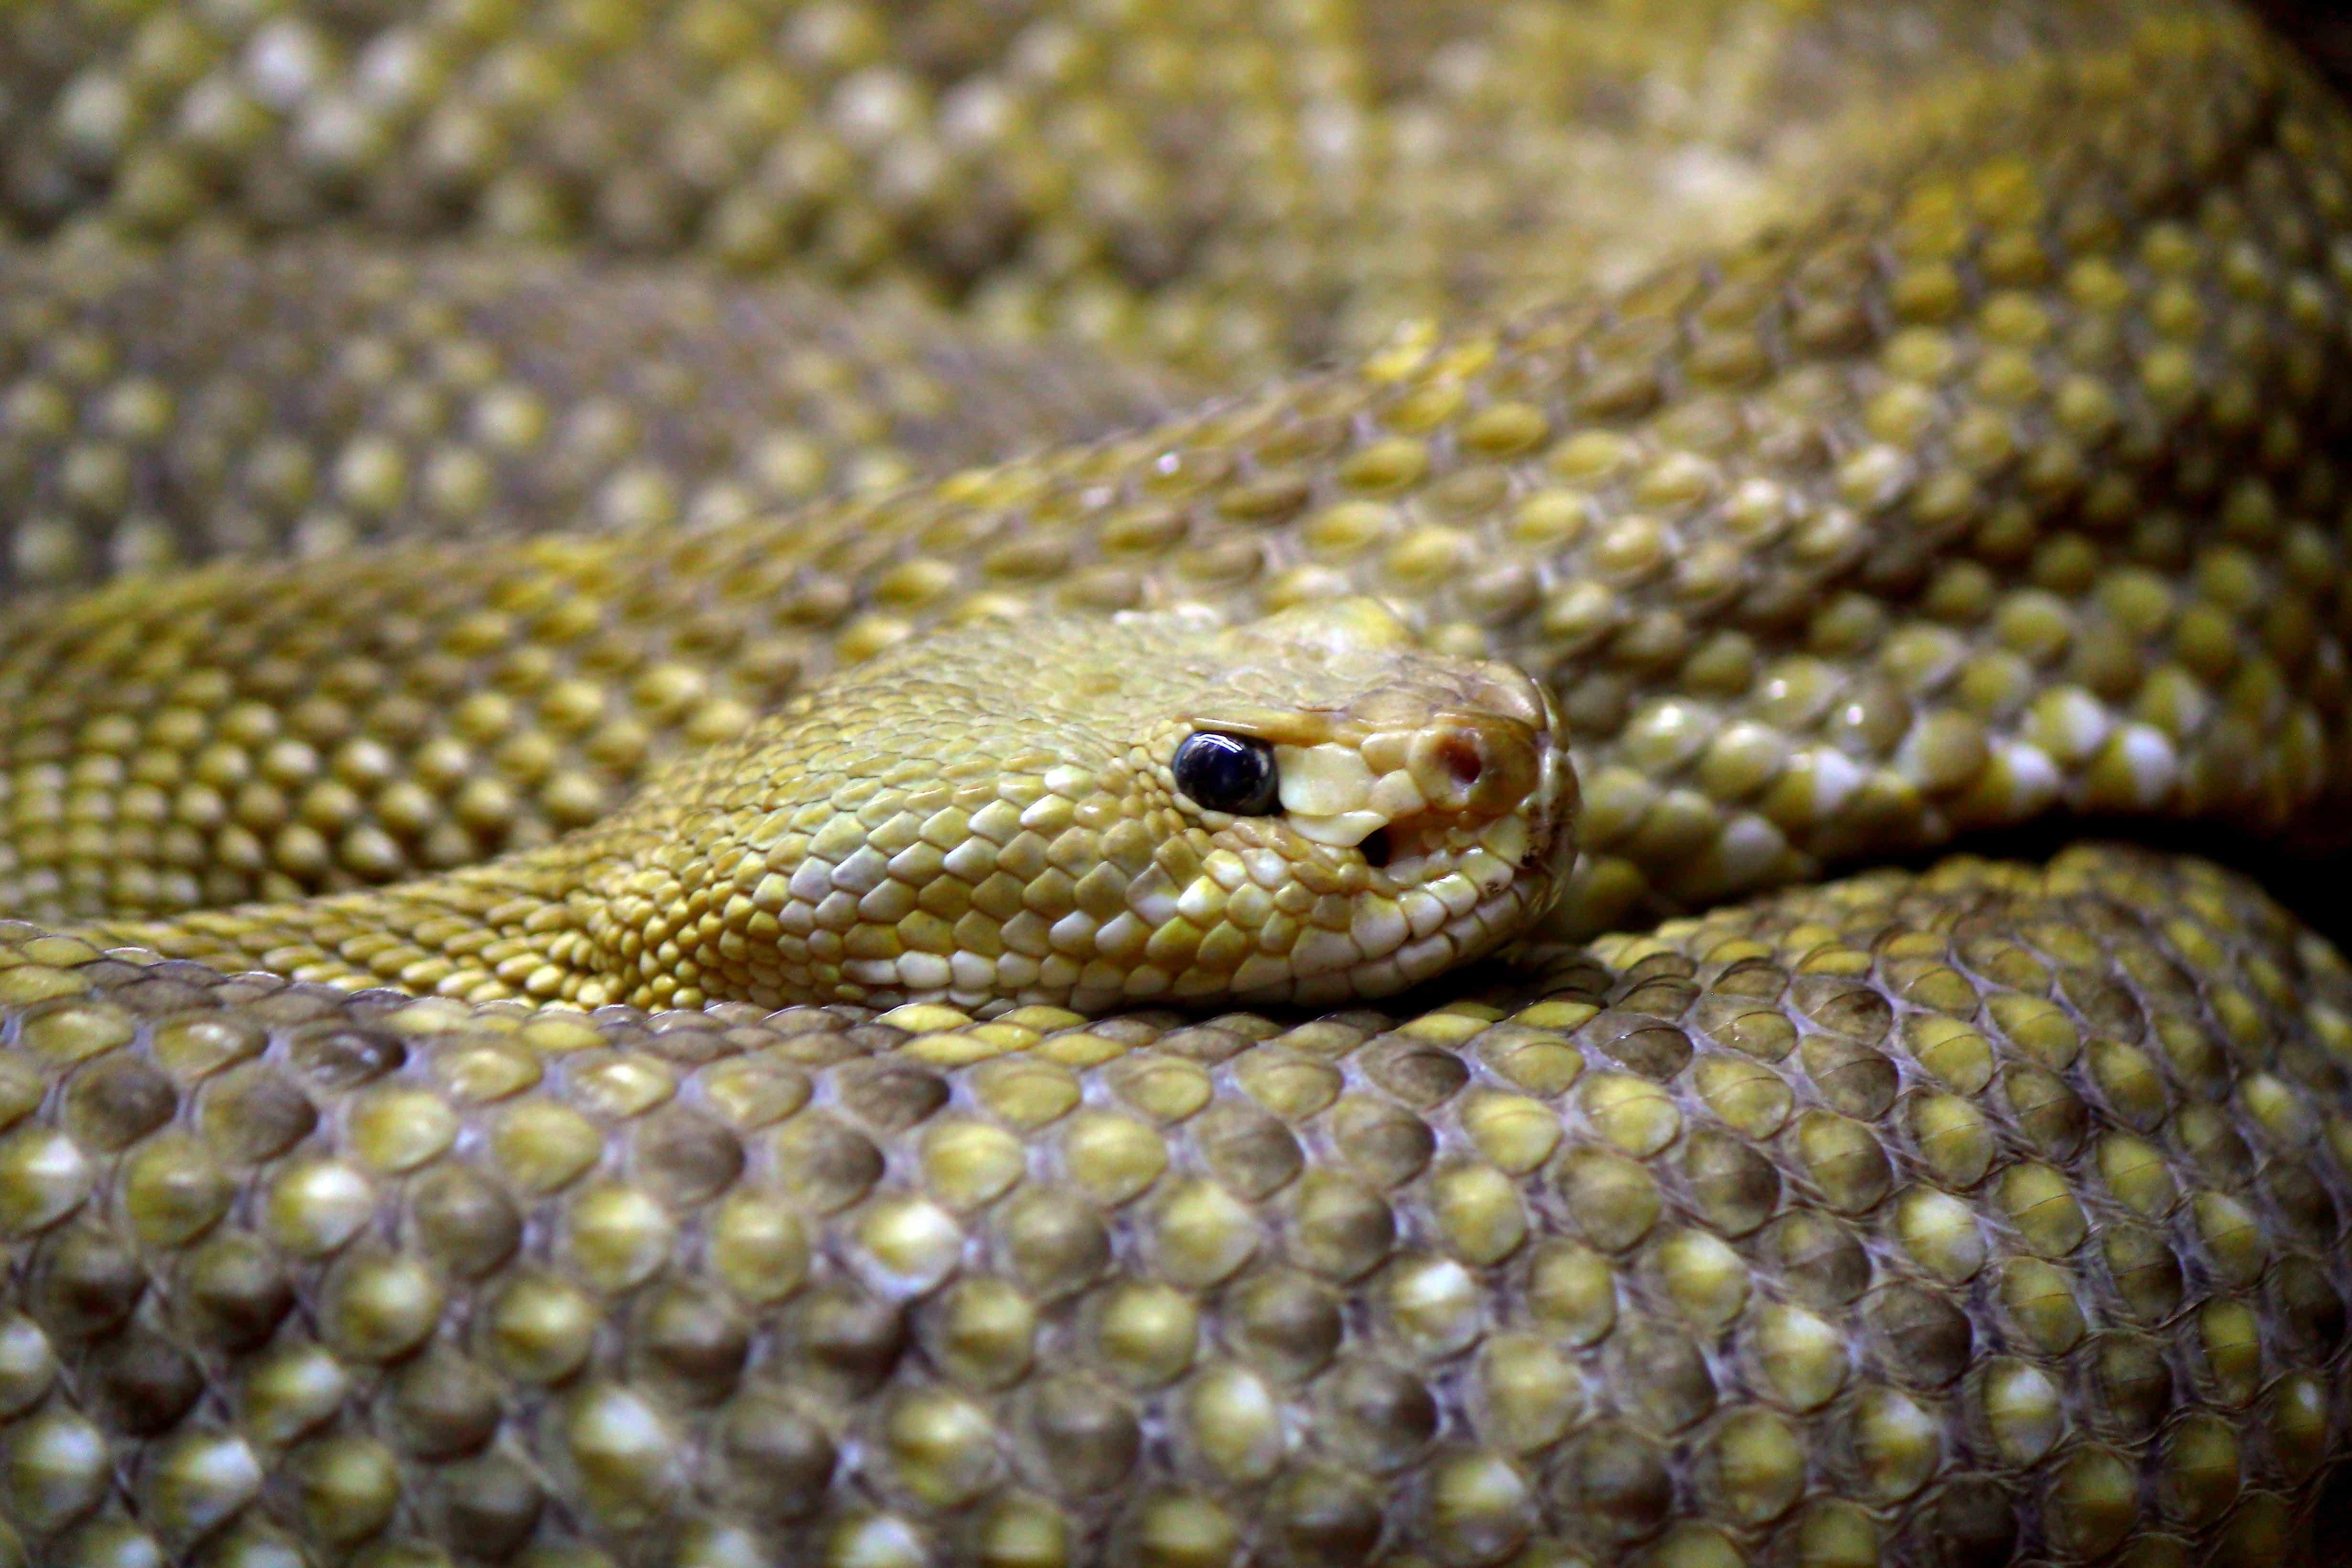 Free Picture Rattlesnake Camouflage Cobra Reptile Wildlife